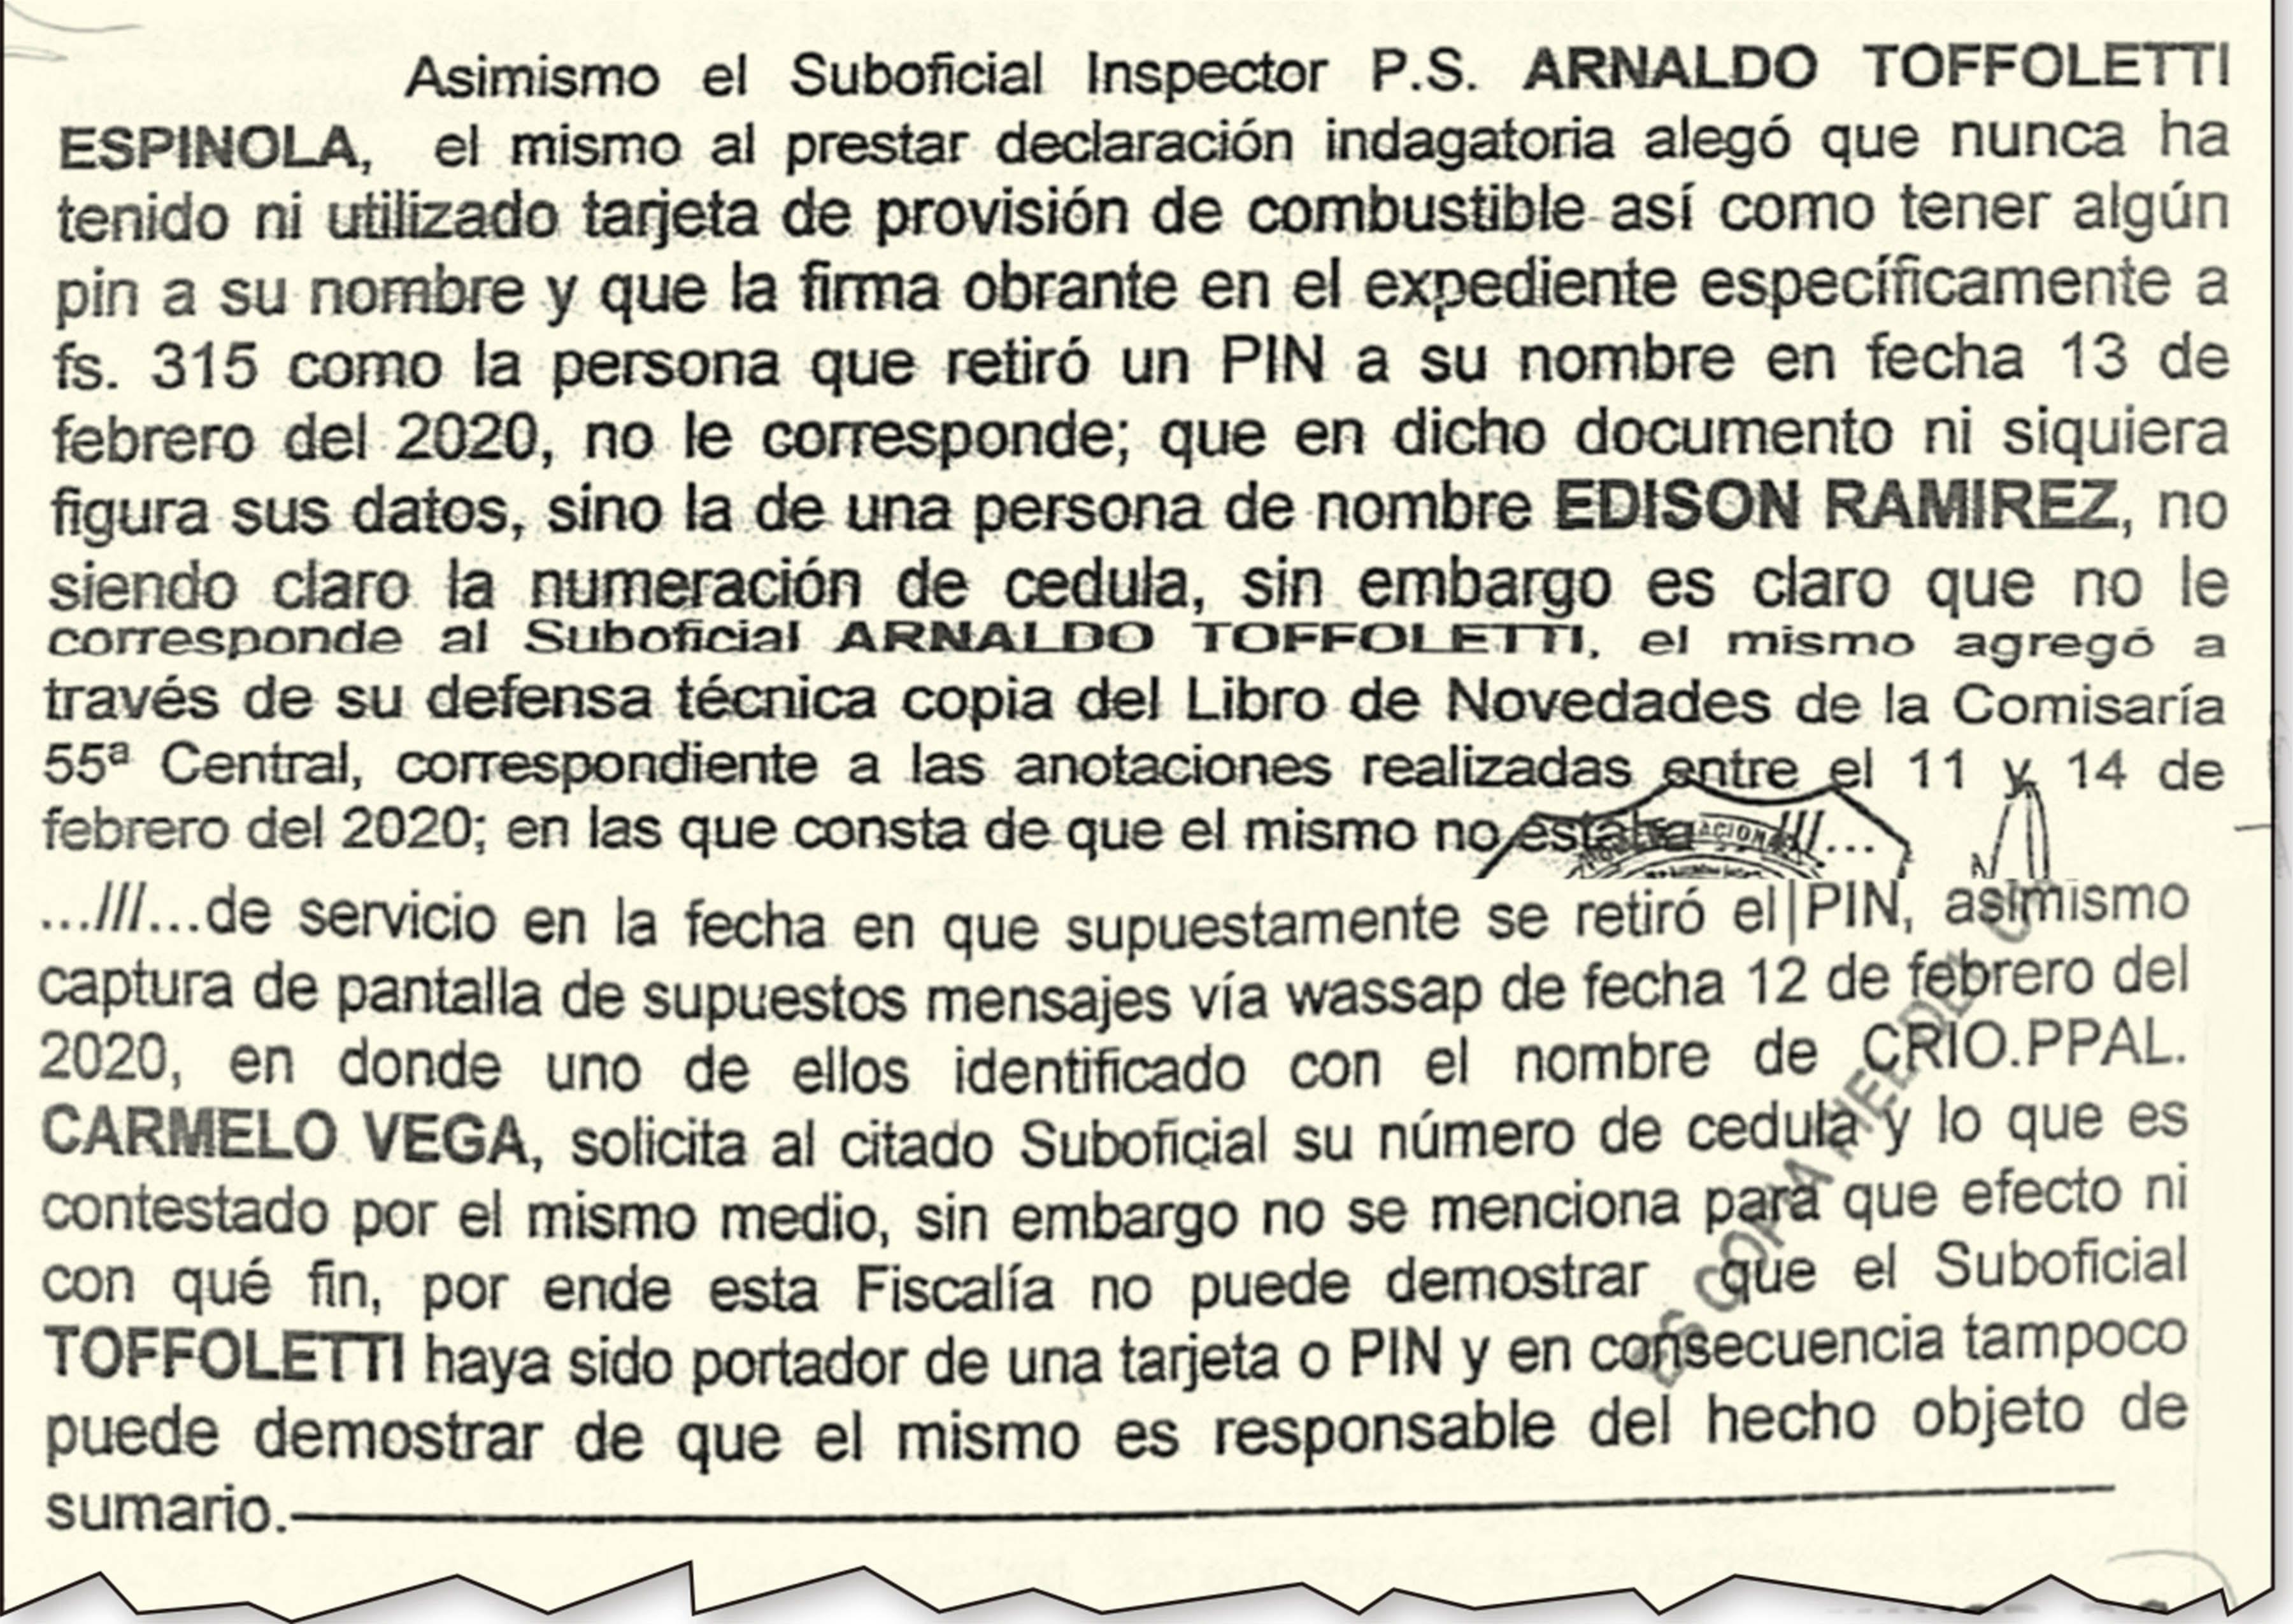 3- El suboficial inspector Arnaldo Toffoletti complicó a un comisario principal de nombre Carmelo Vega.